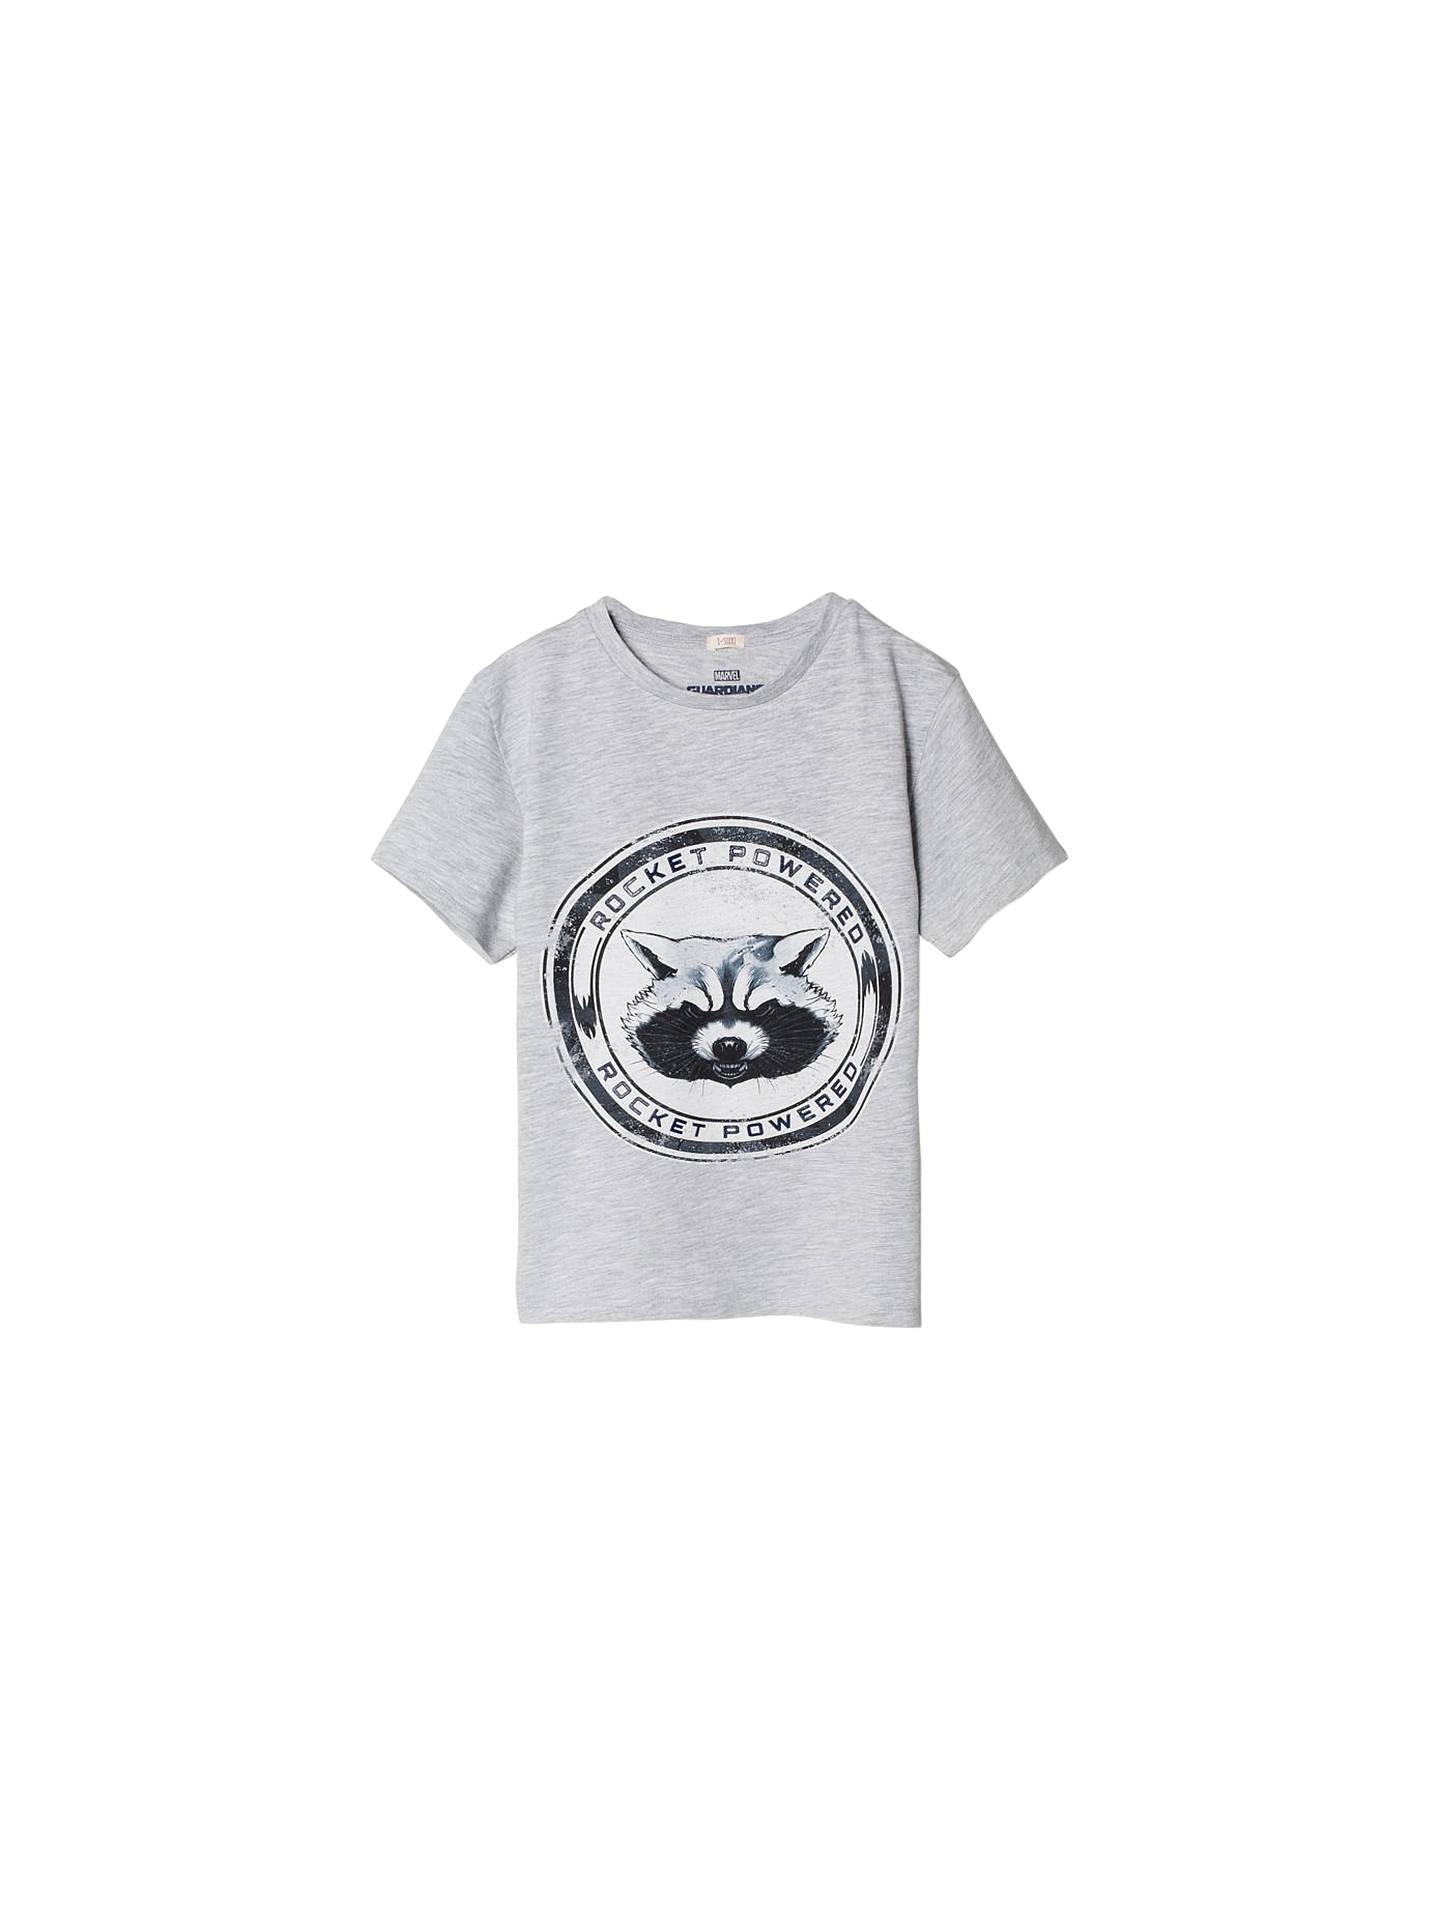 23956f992ad Mango Kids Boys' Marvel Guardians of the Galaxy Rocket T-Shirt ...